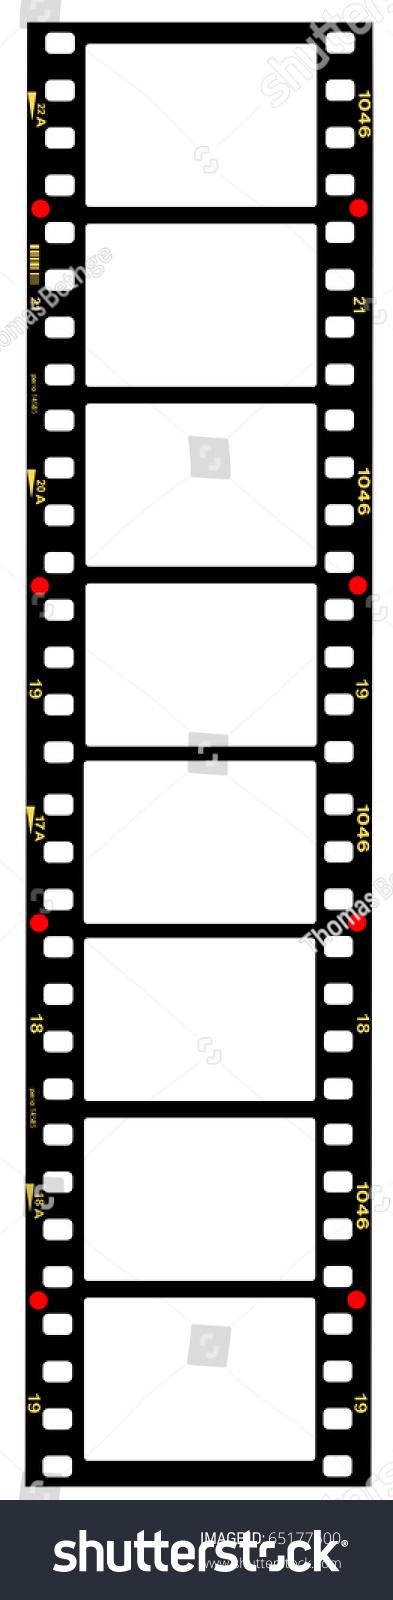 35 Mm Format Movie Filmstrip Picture Framesstandard Stock ...